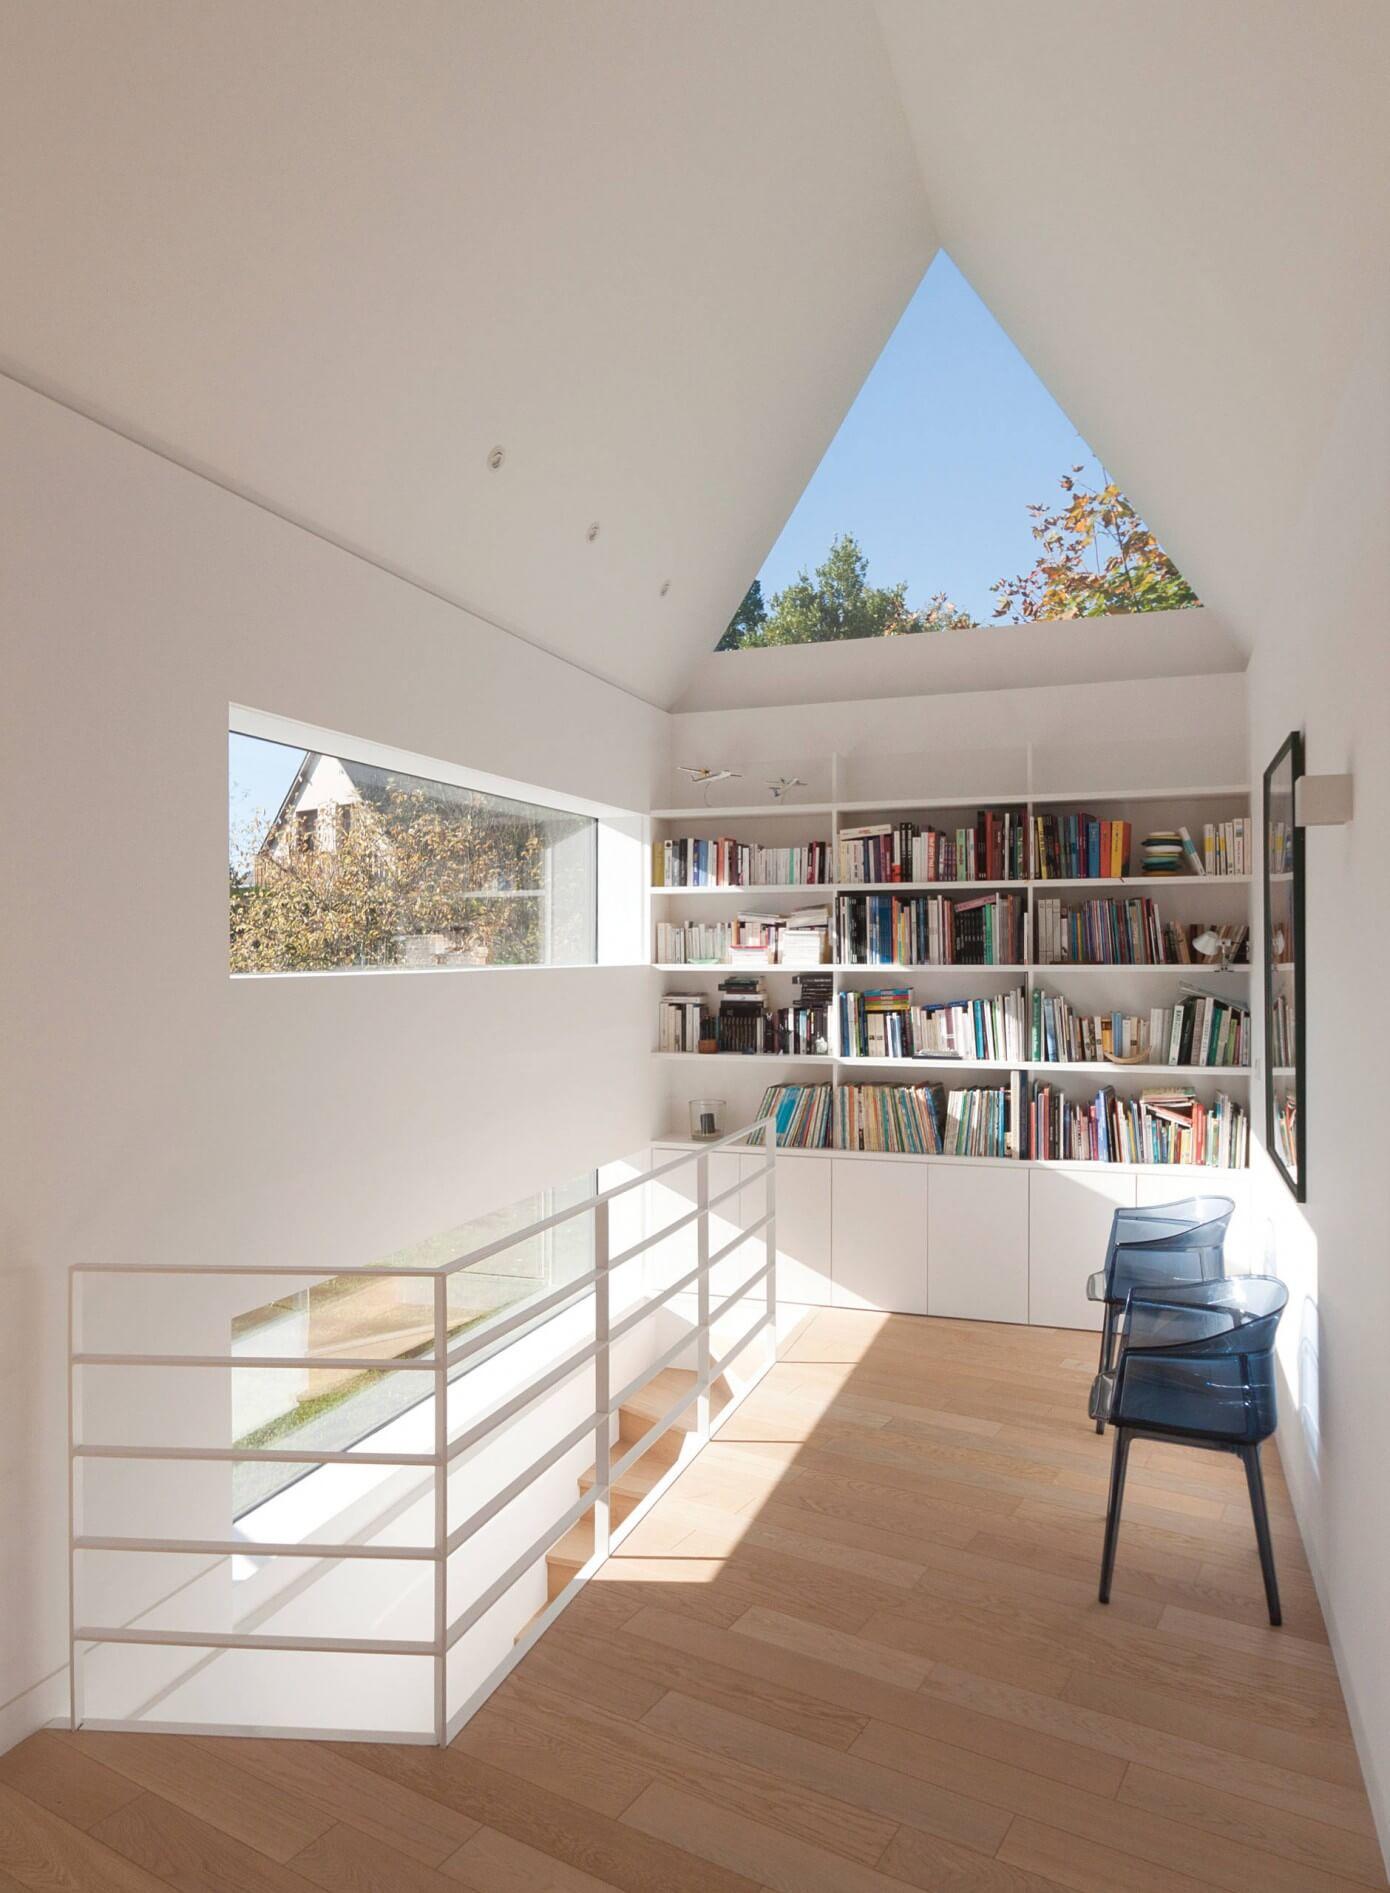 011 house saintcastleguildo feld architecture homeadore. Black Bedroom Furniture Sets. Home Design Ideas